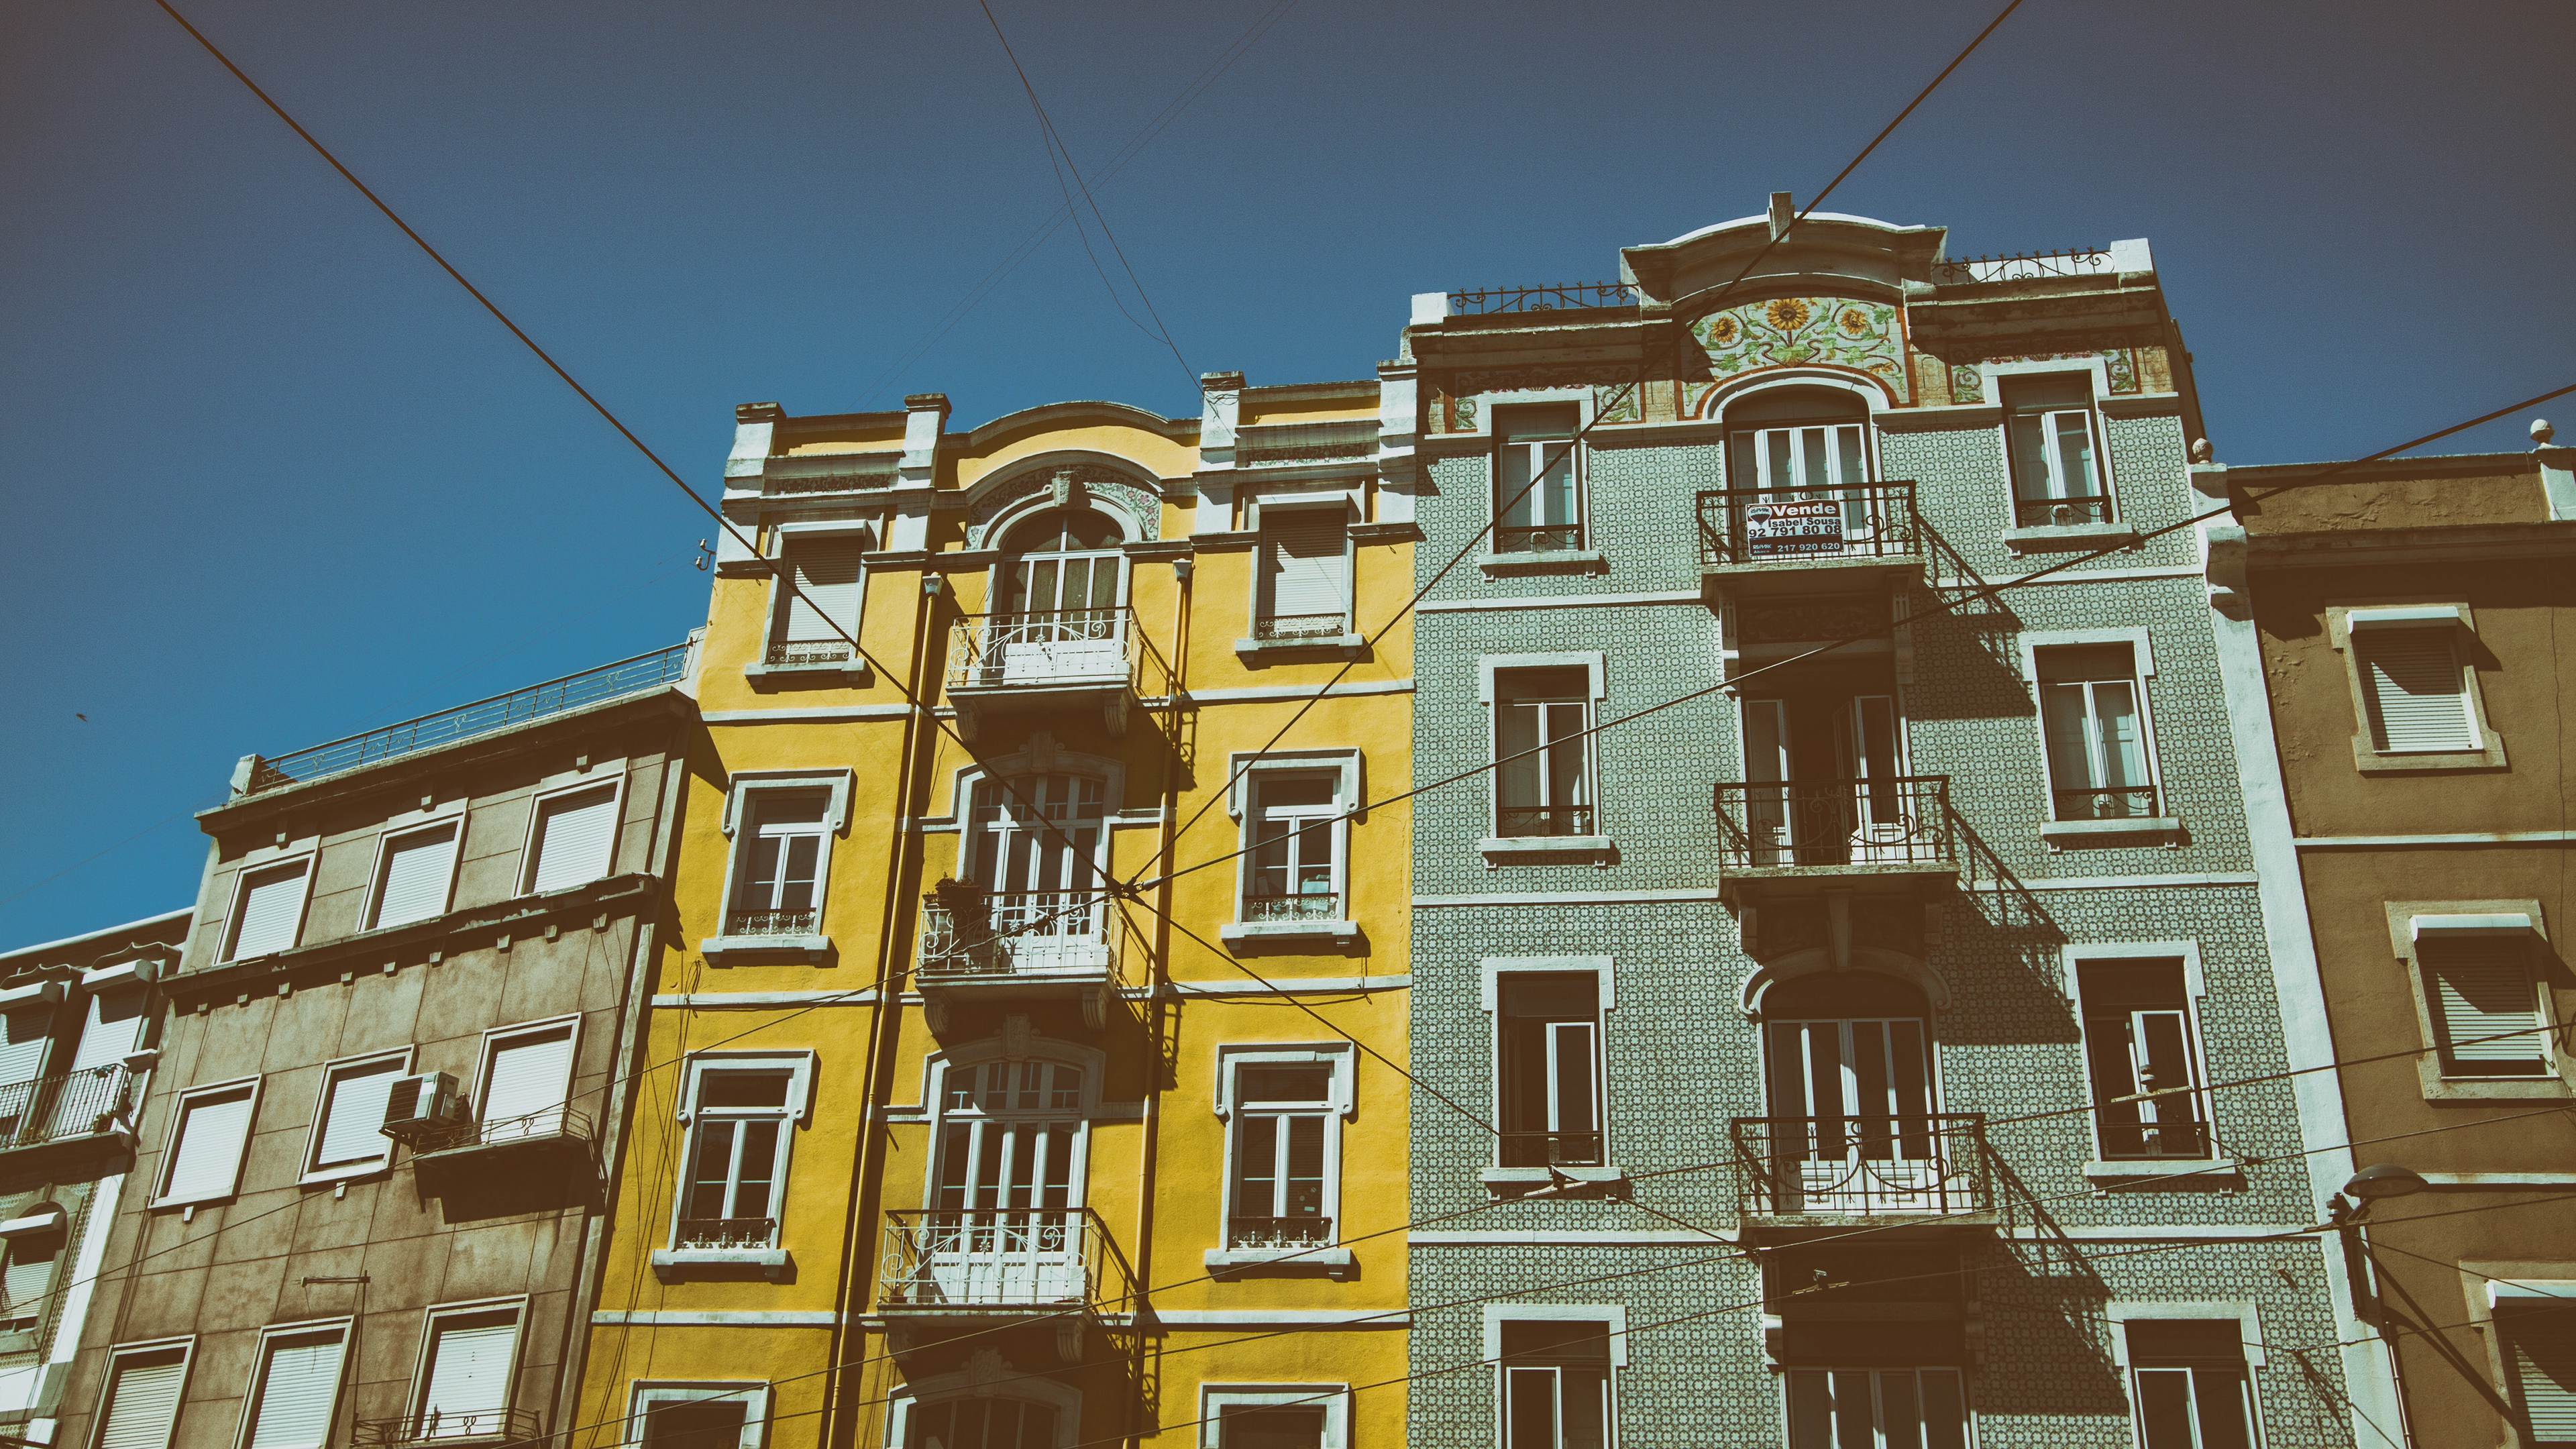 lisbon portugal buildings windows 4k 1538066713 - lisbon, portugal, buildings, windows 4k - Portugal, Lisbon, buildings